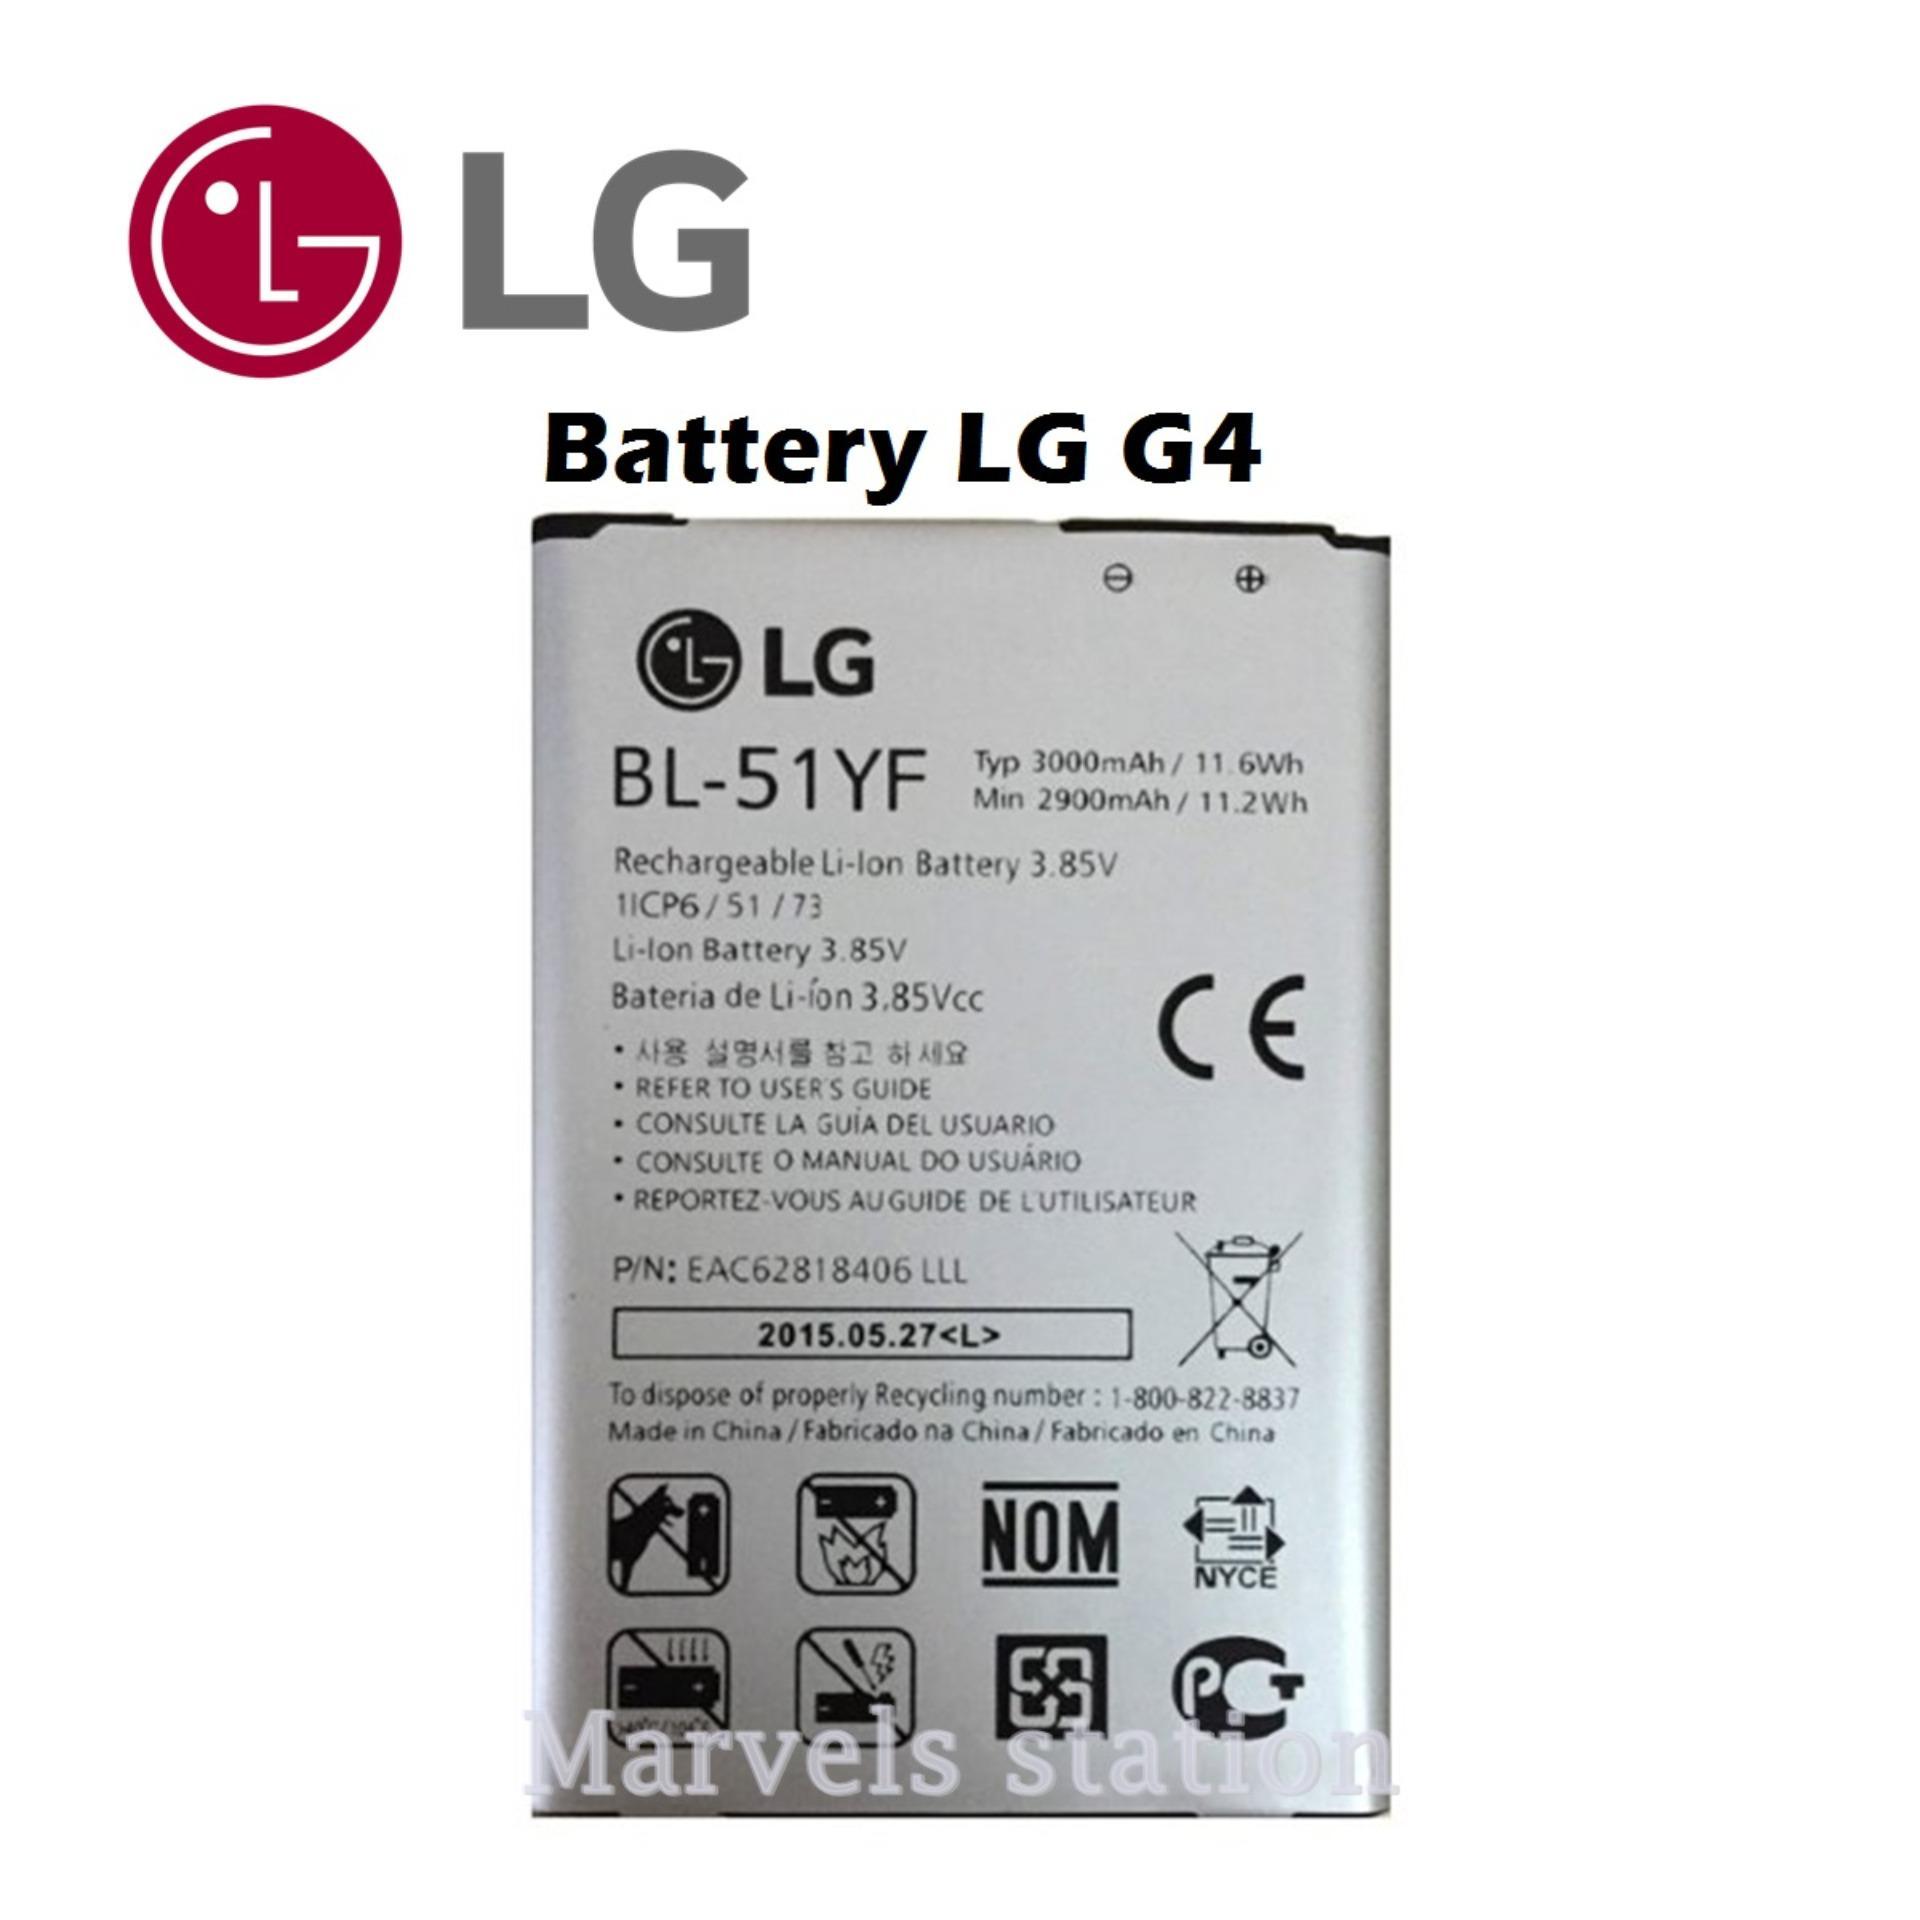 Jual Lg Baterai Battery Lg G4 Bl 51Yf 3000Mah Original Online